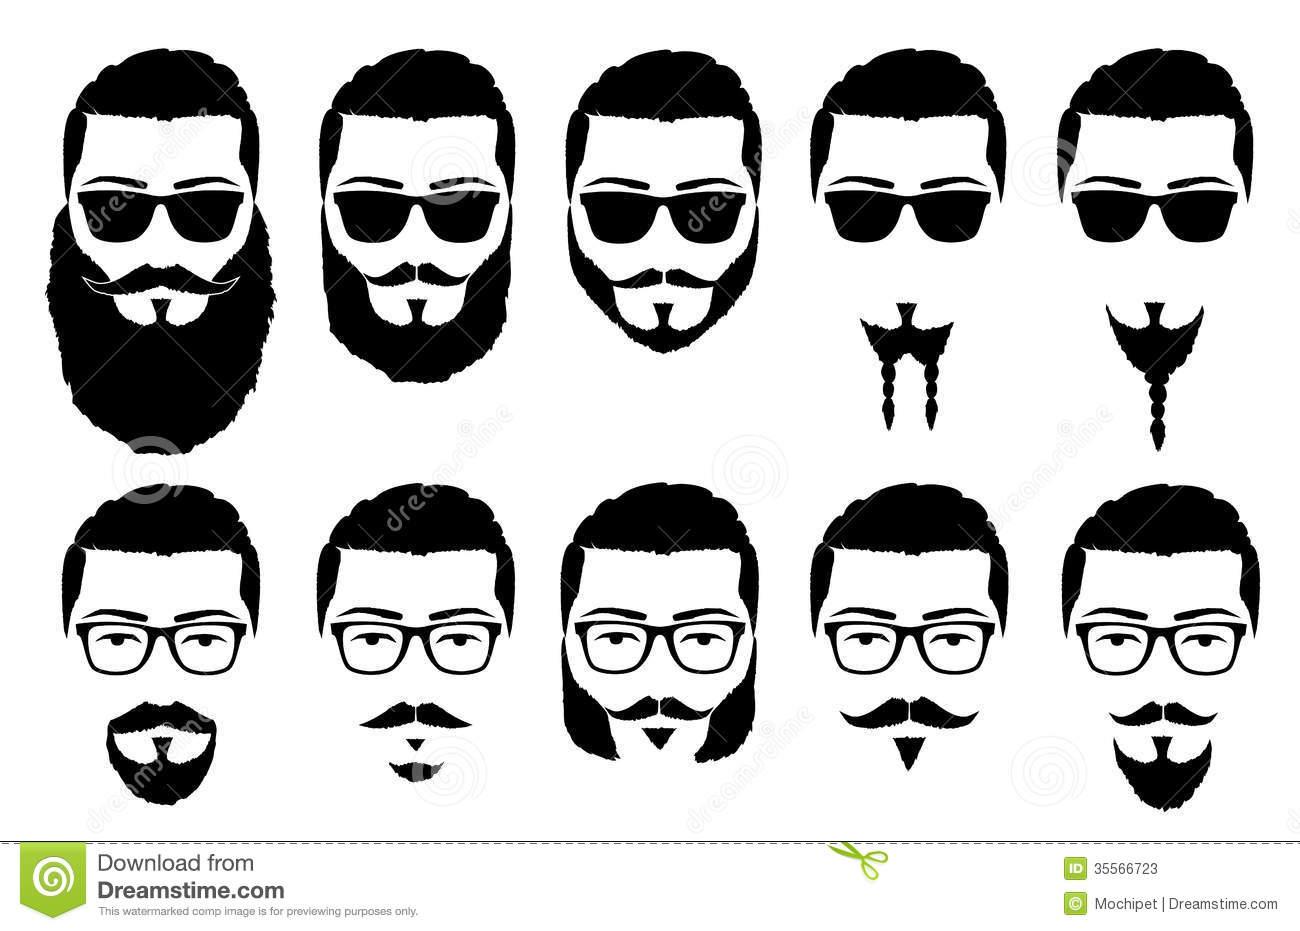 Beard clipart duck dynasty beard. Beards cliparts and mustaches